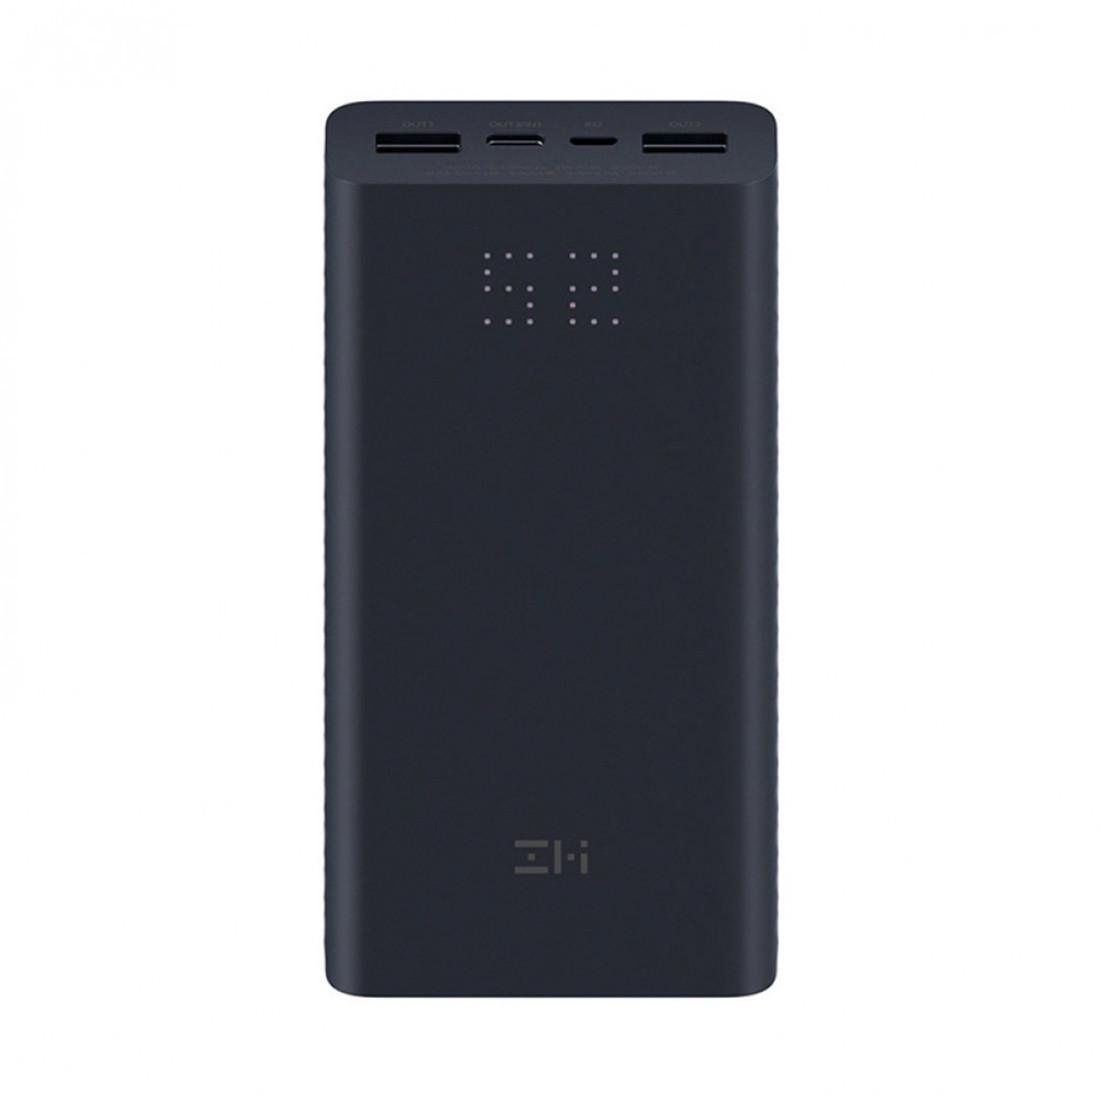 Портативное зарядное устройство Xiaomi ZMi 20000mAh